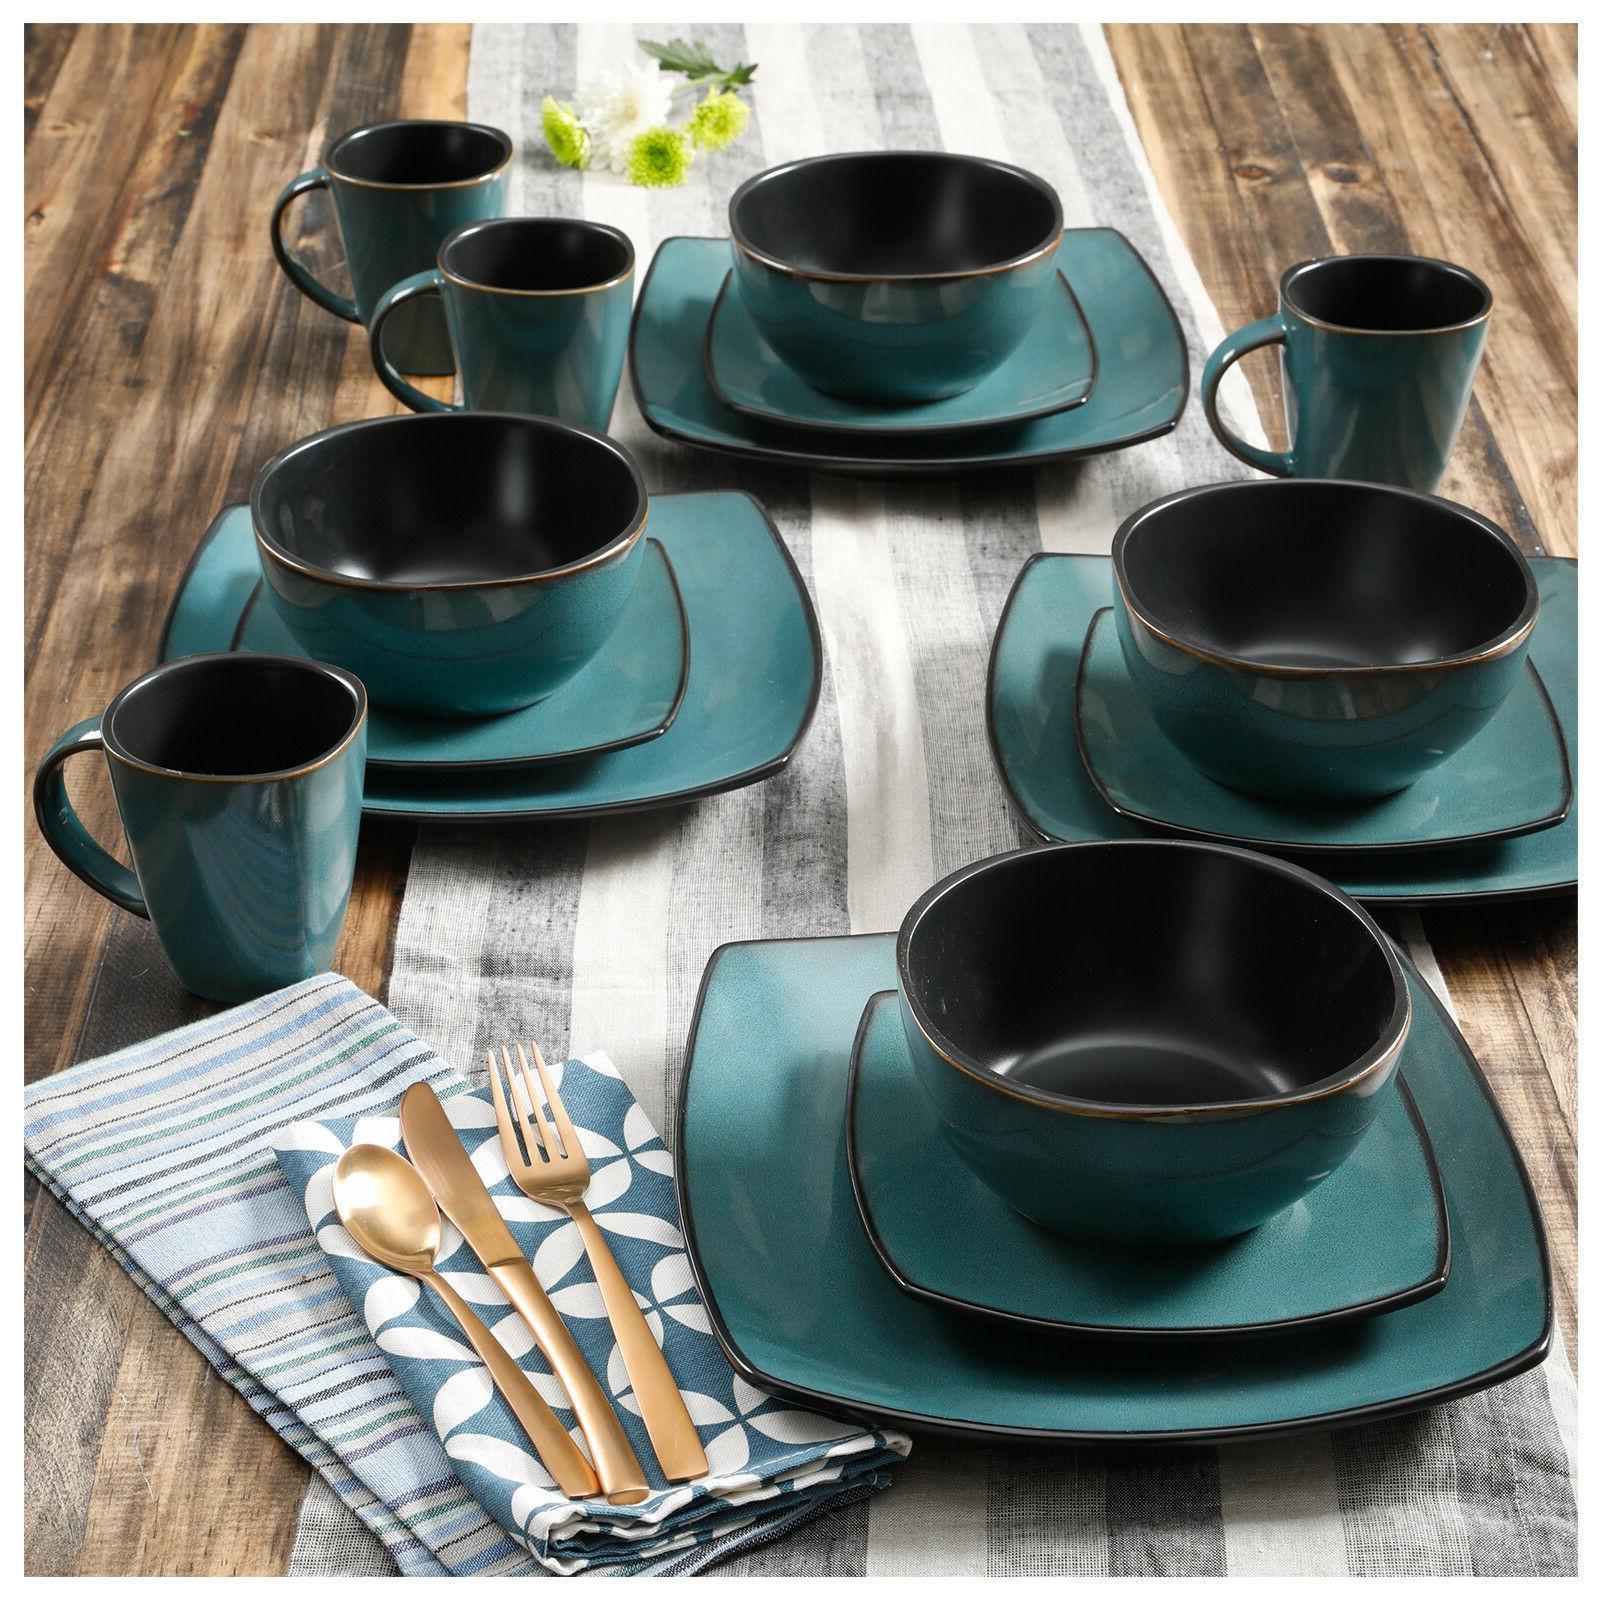 Square Dinnerware Set For 8 85Pcs Kitchen 32Pc Plates Bowls Dishes Mug